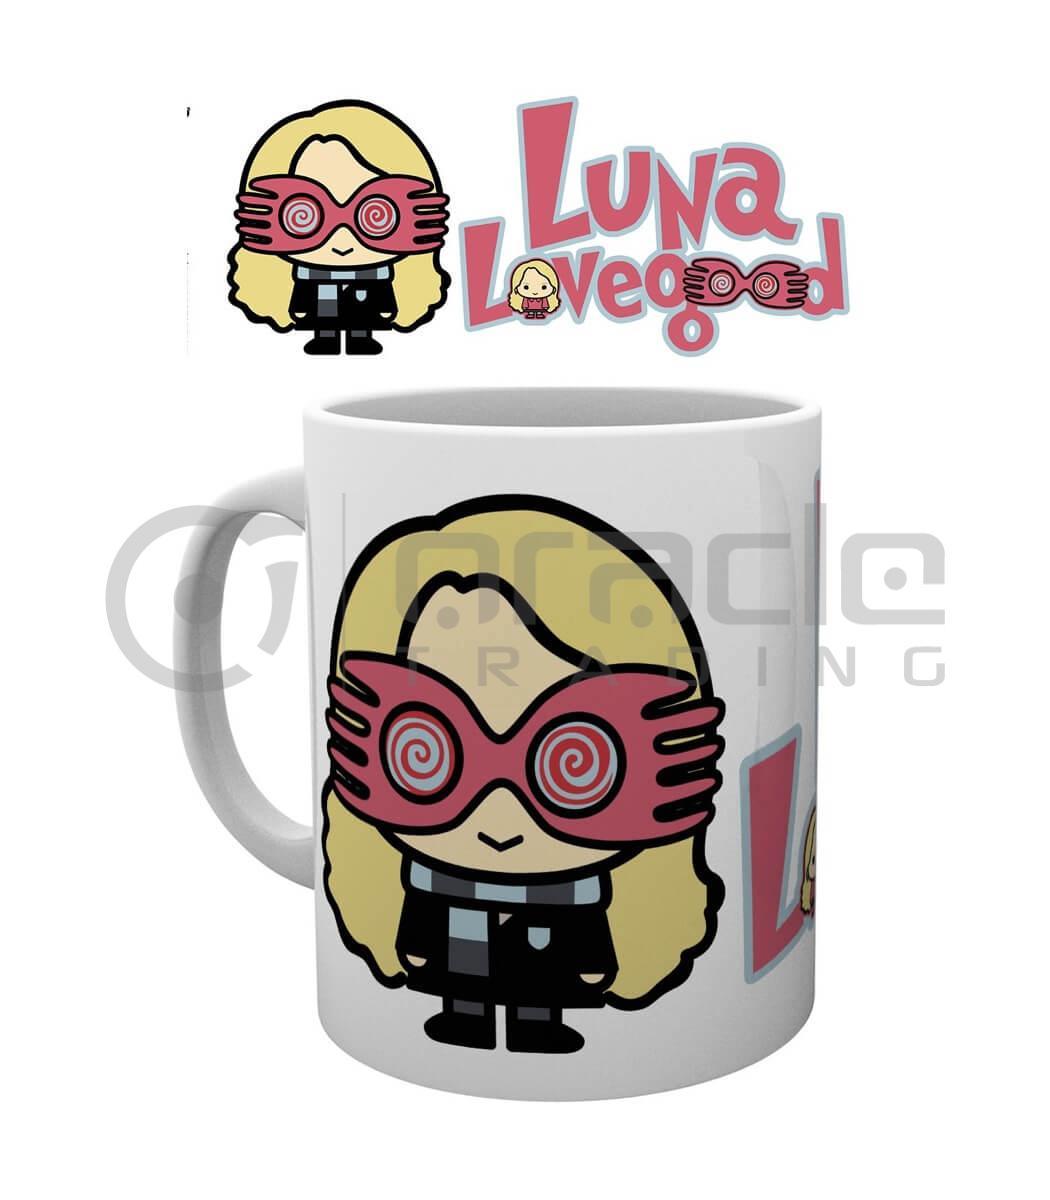 Harry Potter Luna Lovegood Mug